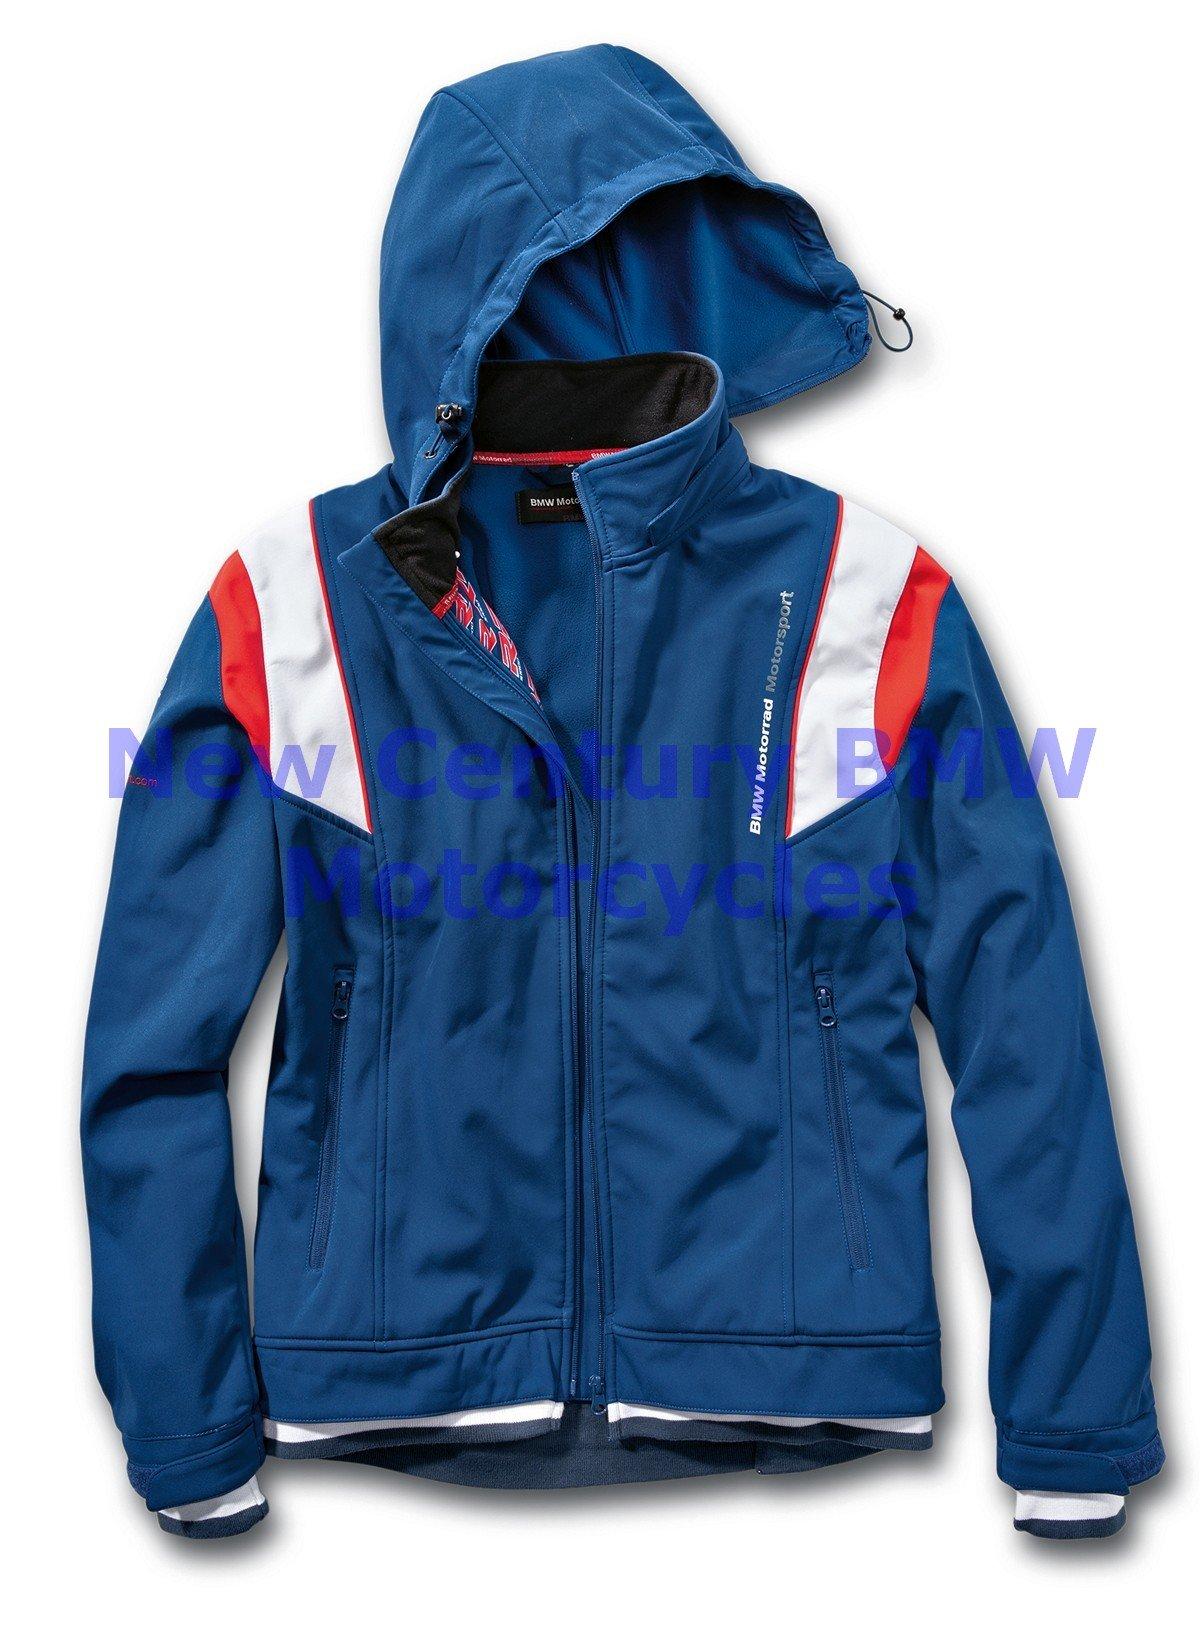 BMW Genuine Motorcycle Unisex Motorsport Softshell Jacket Blue/White/Red XL